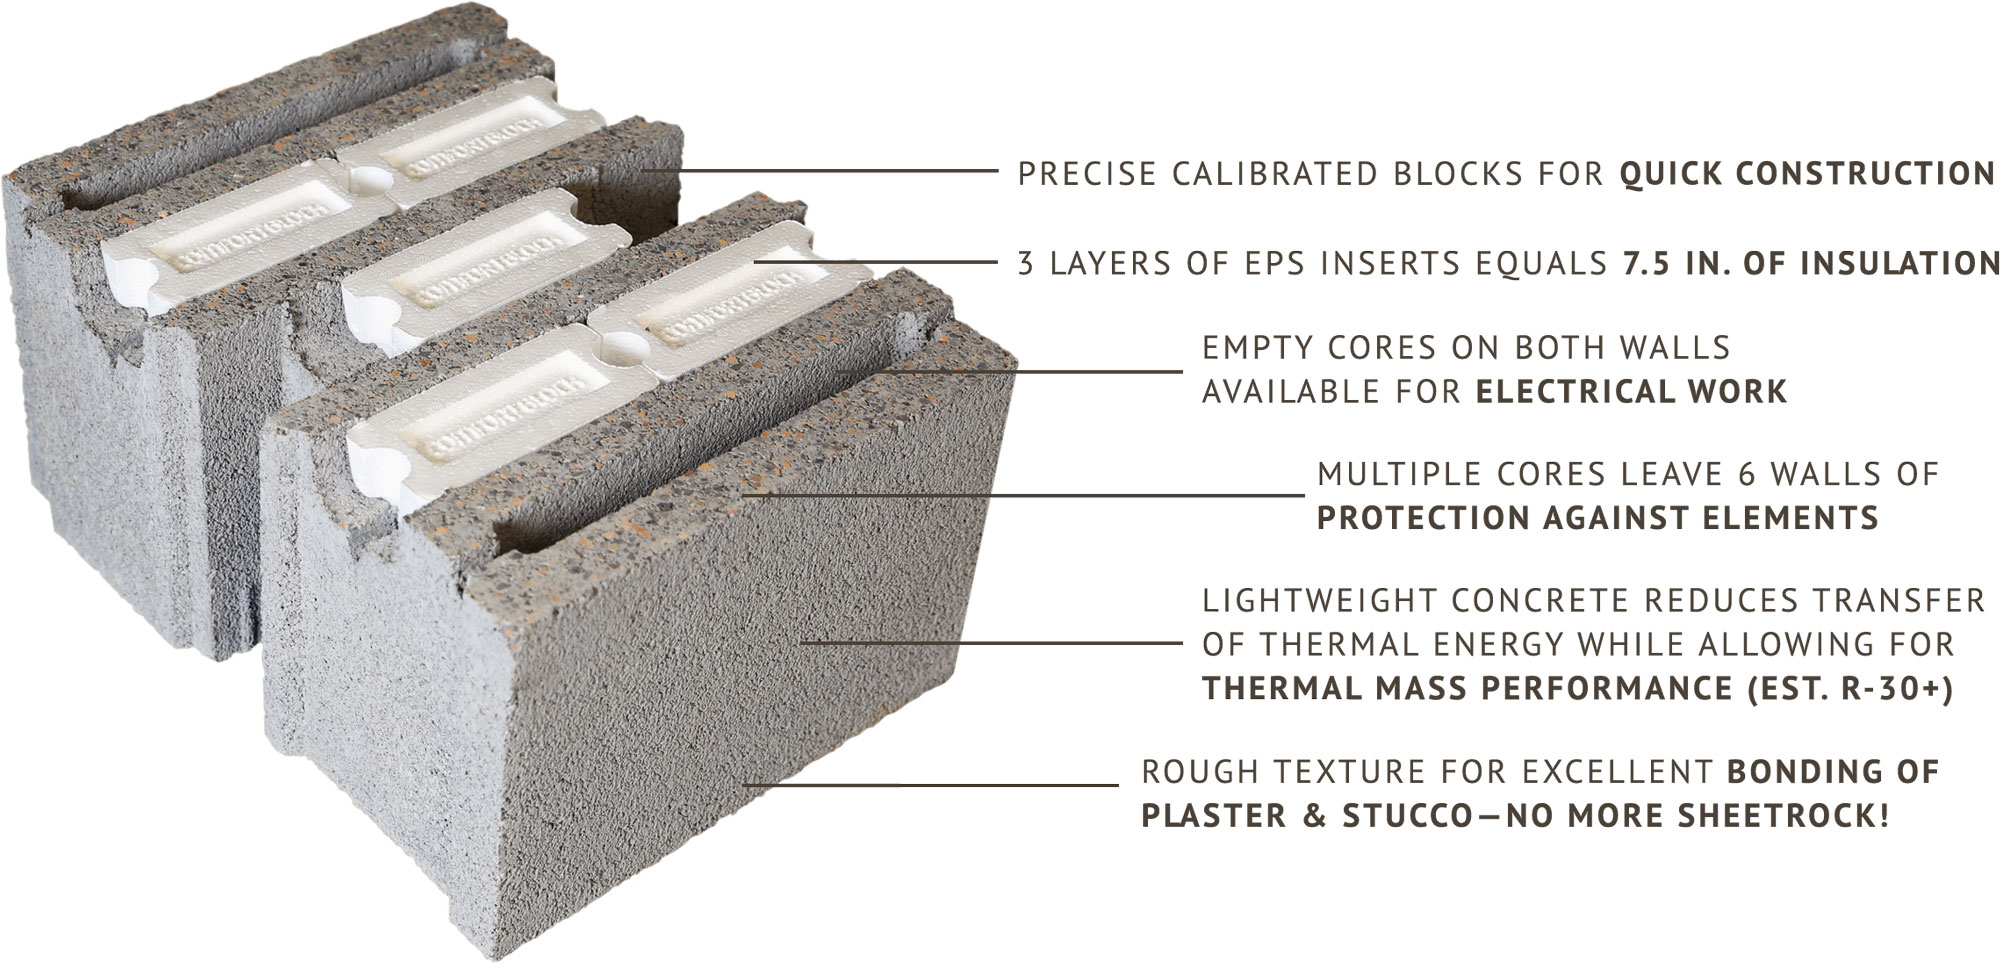 Concrete Block Wall System Masonry Construction Masonry